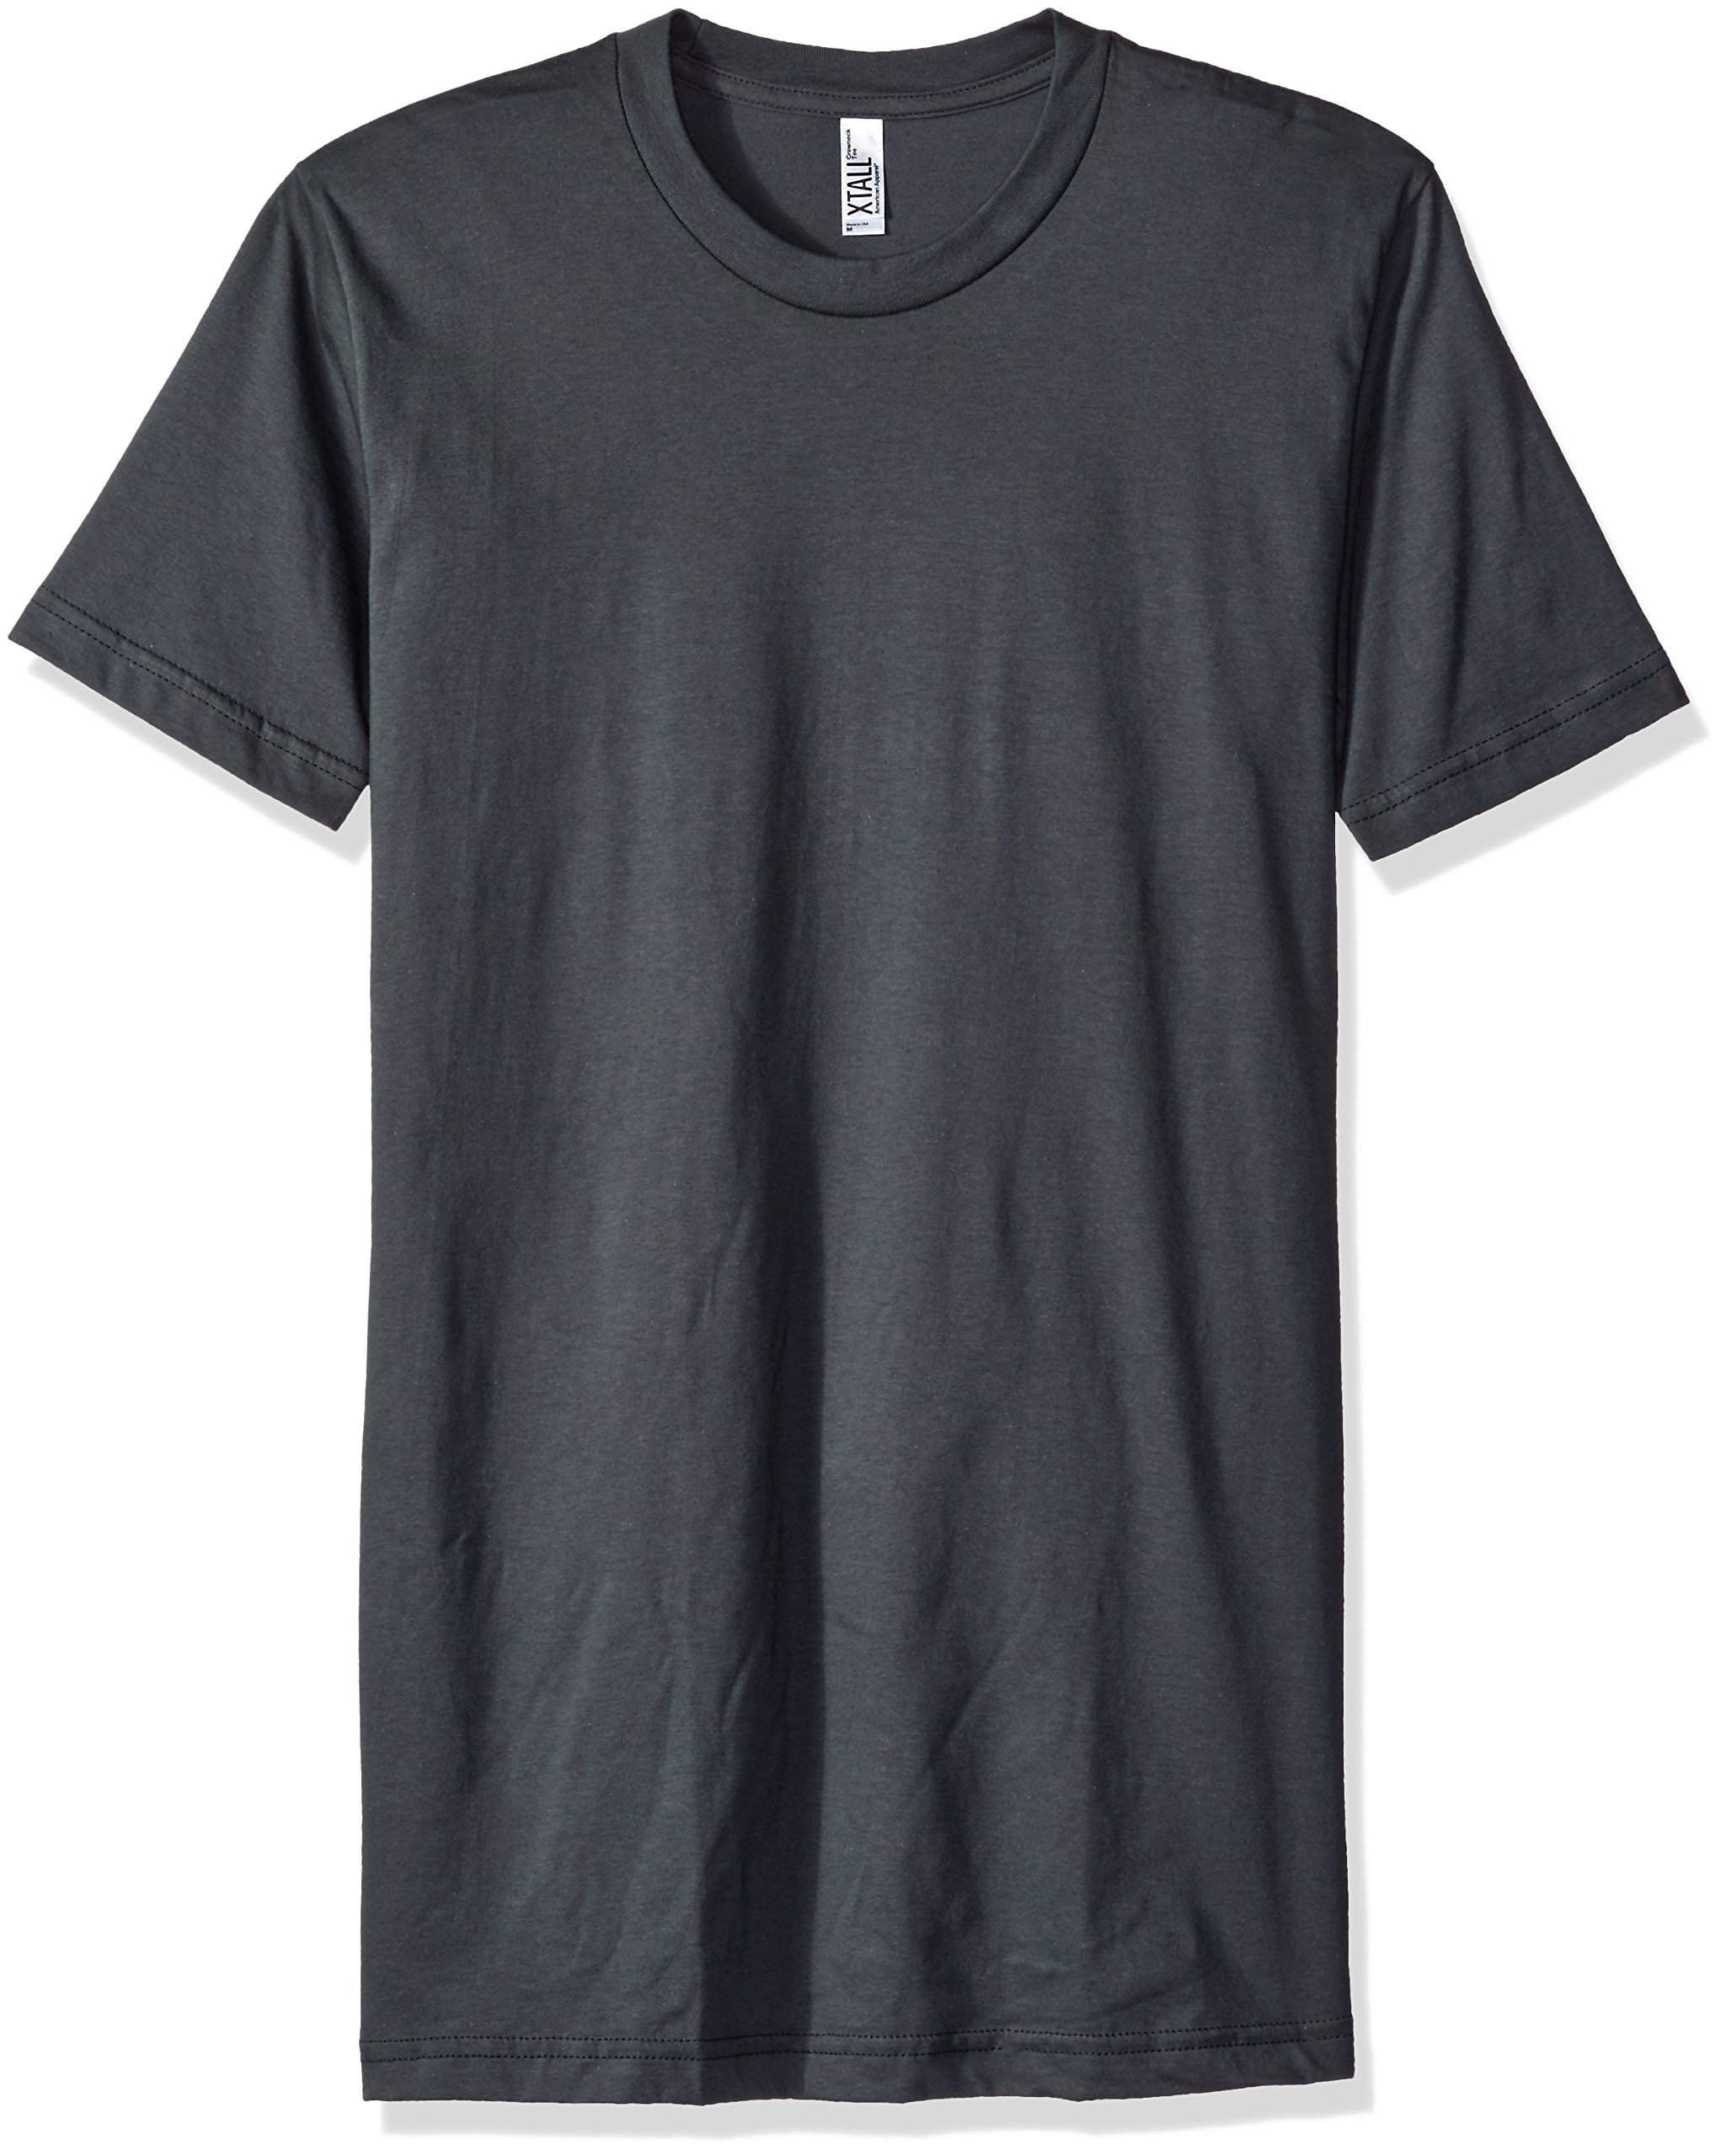 American Apparel Men's Fine Jersey Short Sleeve Tall Tee, Asphalt, X-Large